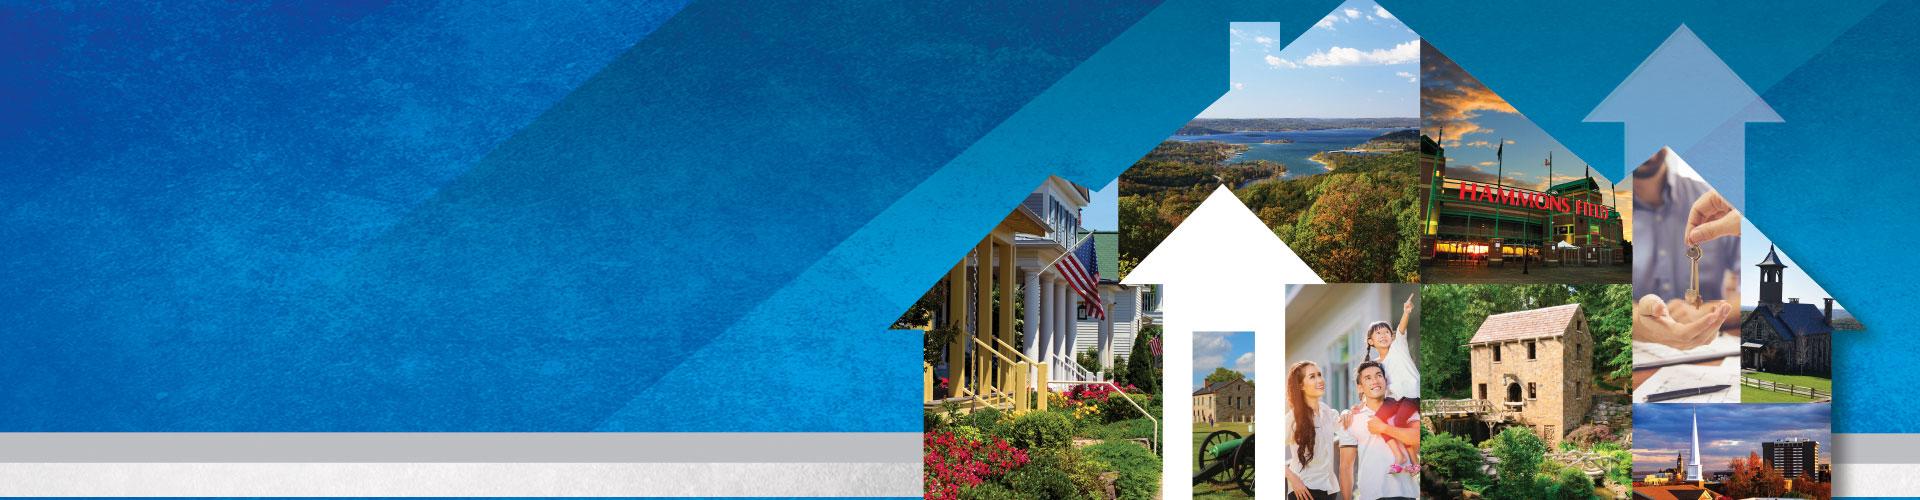 WACO Title - Home Financing Calculators